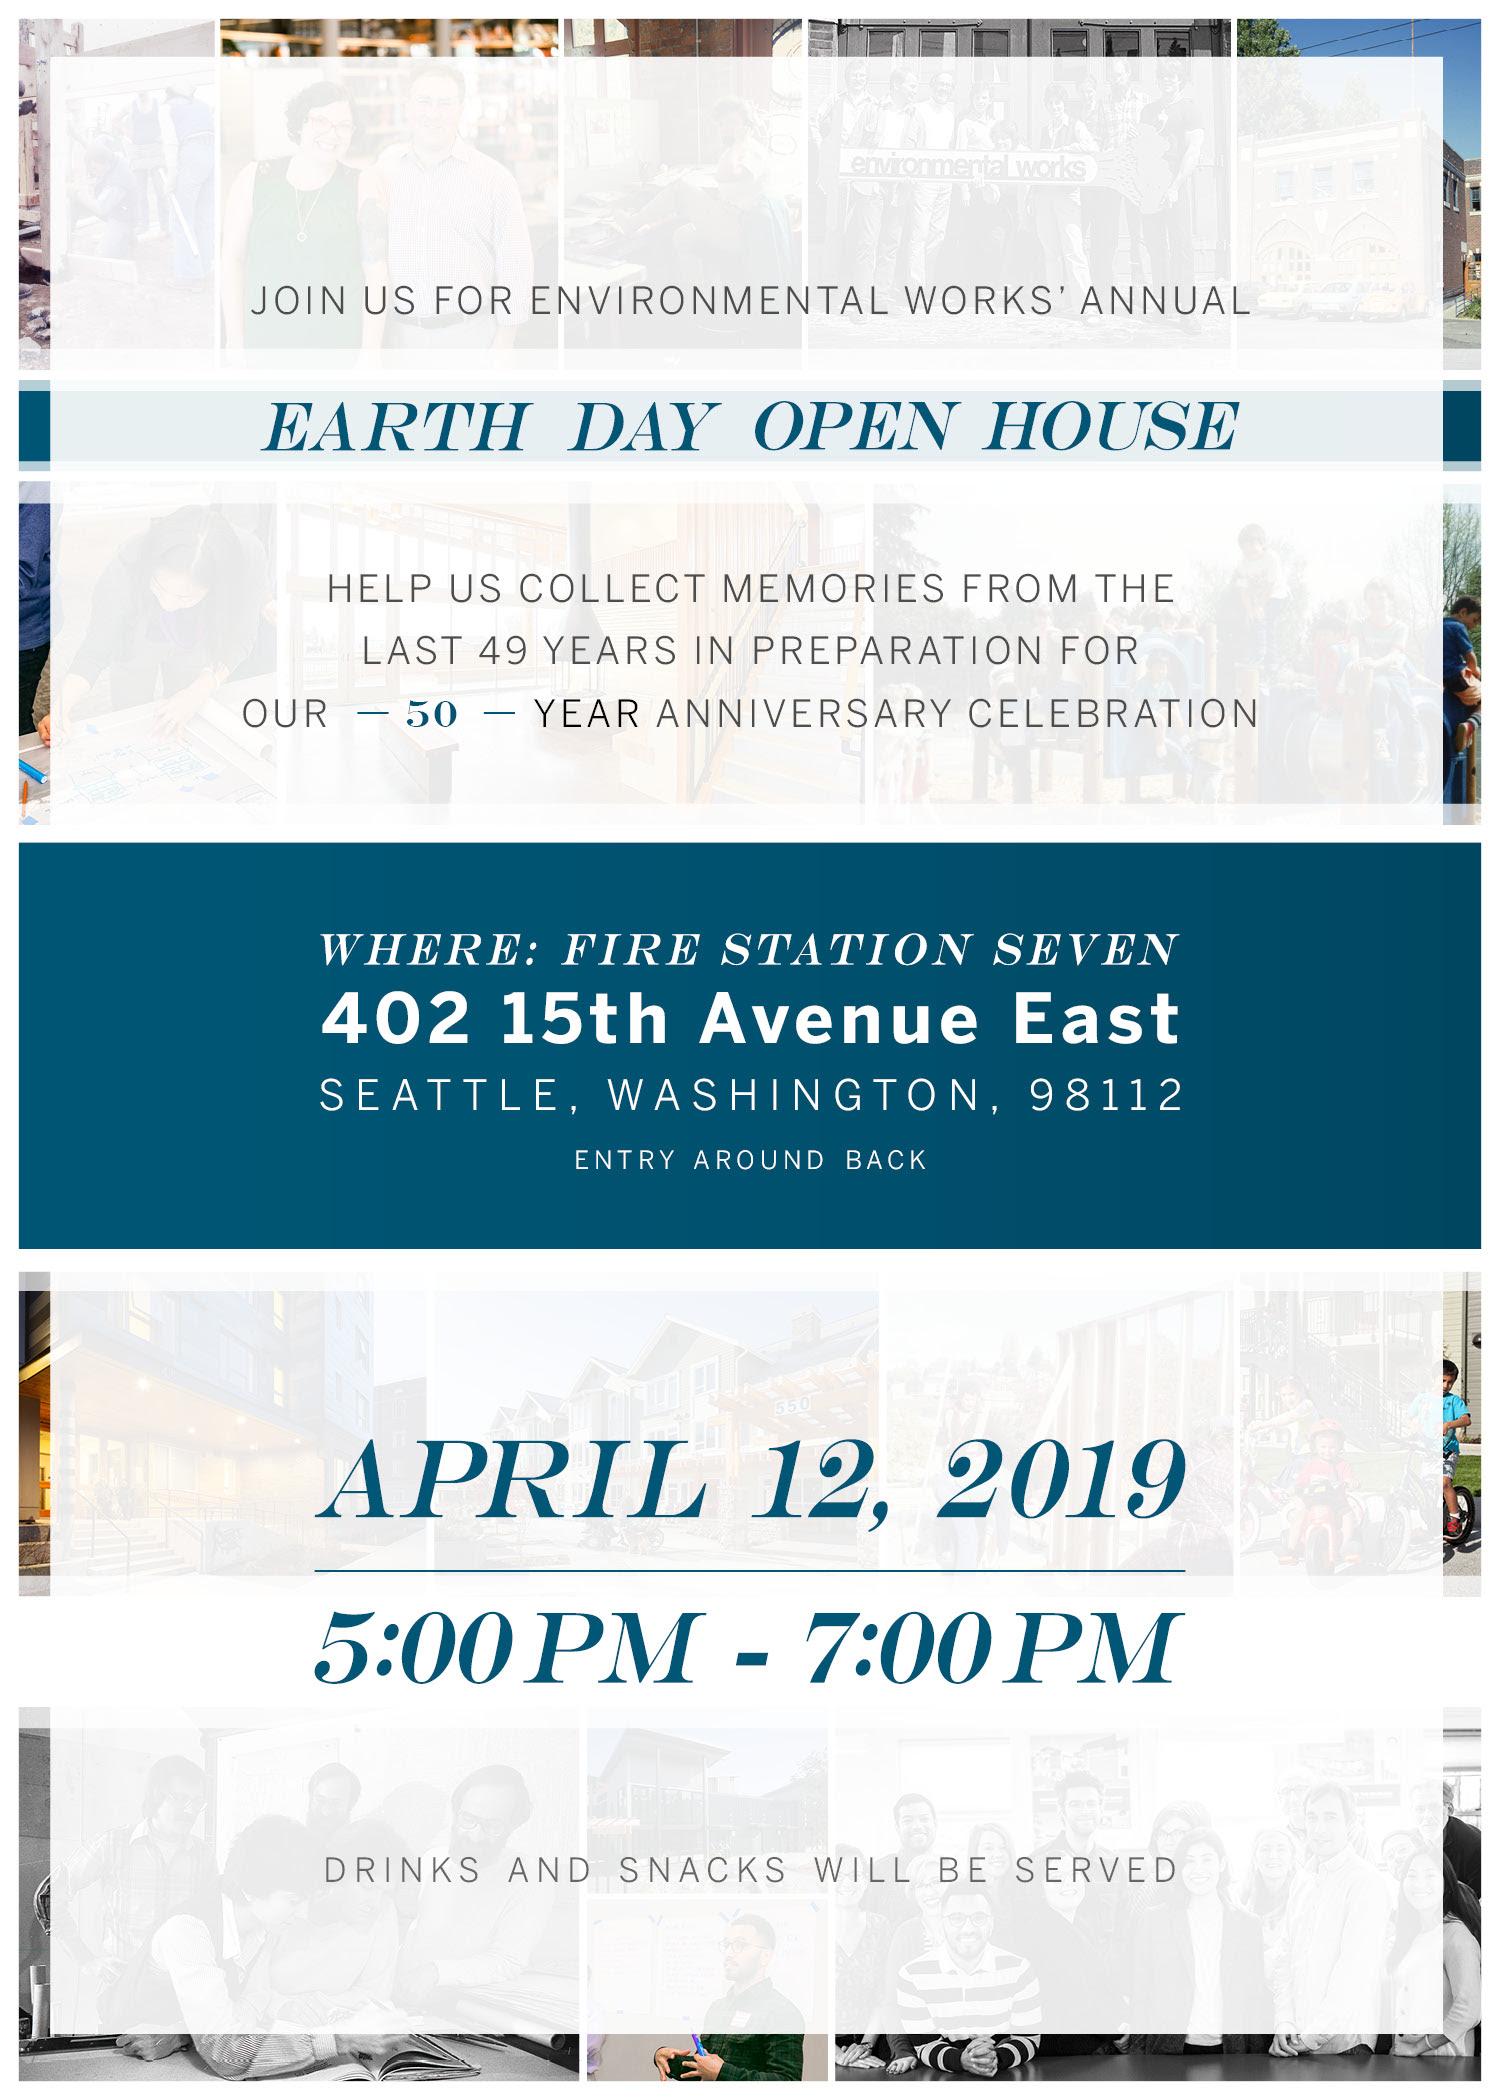 2019 Earth Day invite.jpg